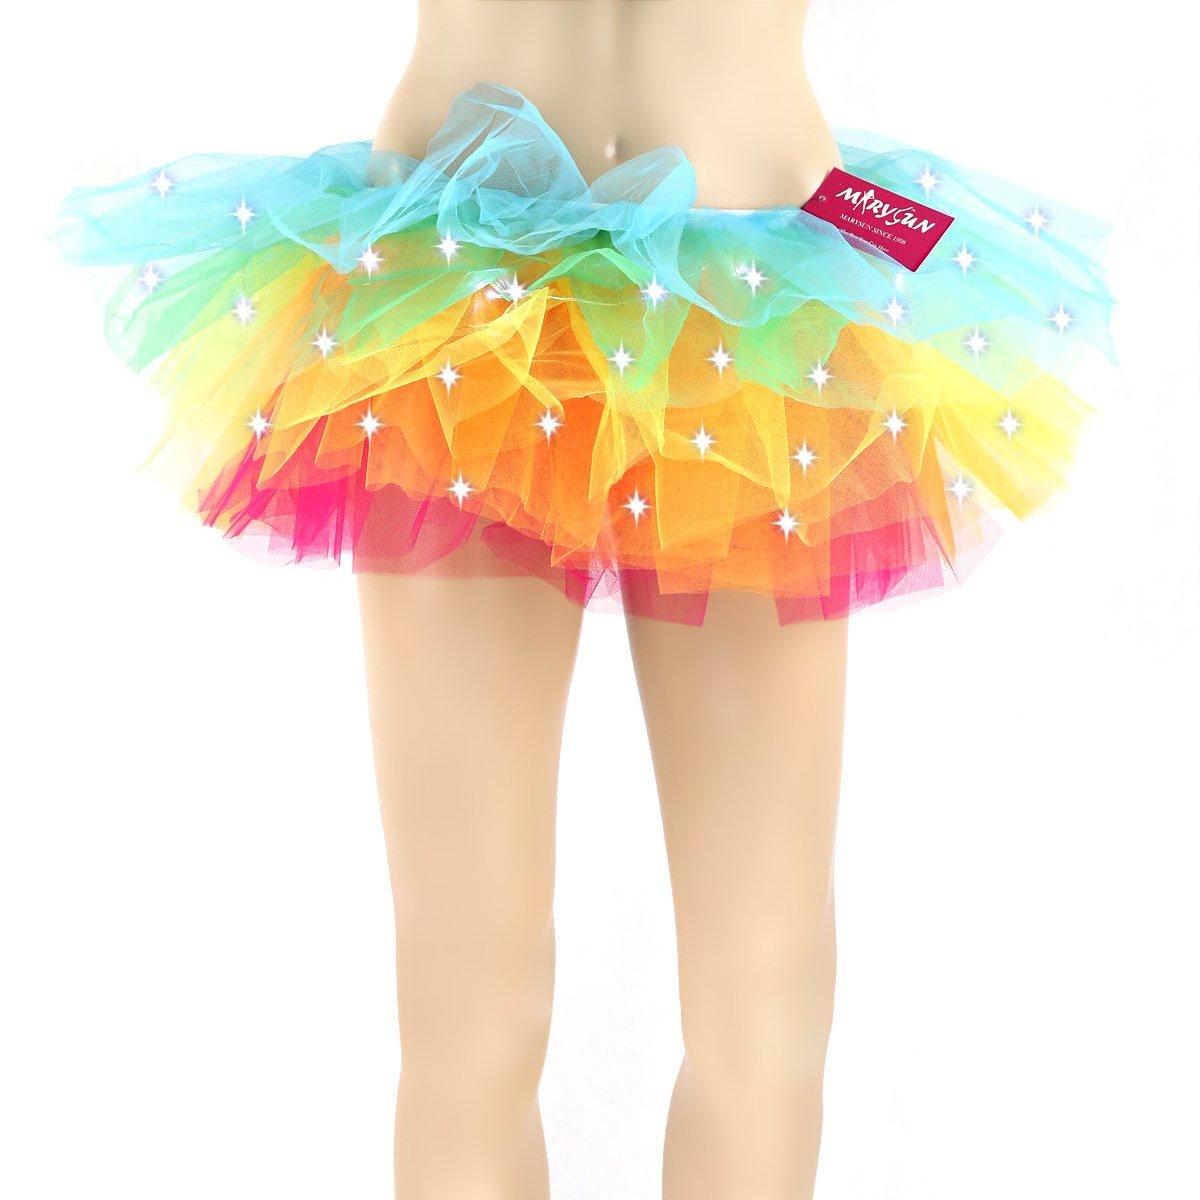 Tutus for Women, MARYSUN Adult Led Tutu Neon Rainbow Tutu Party Skirts for Girls by MARRYSUN